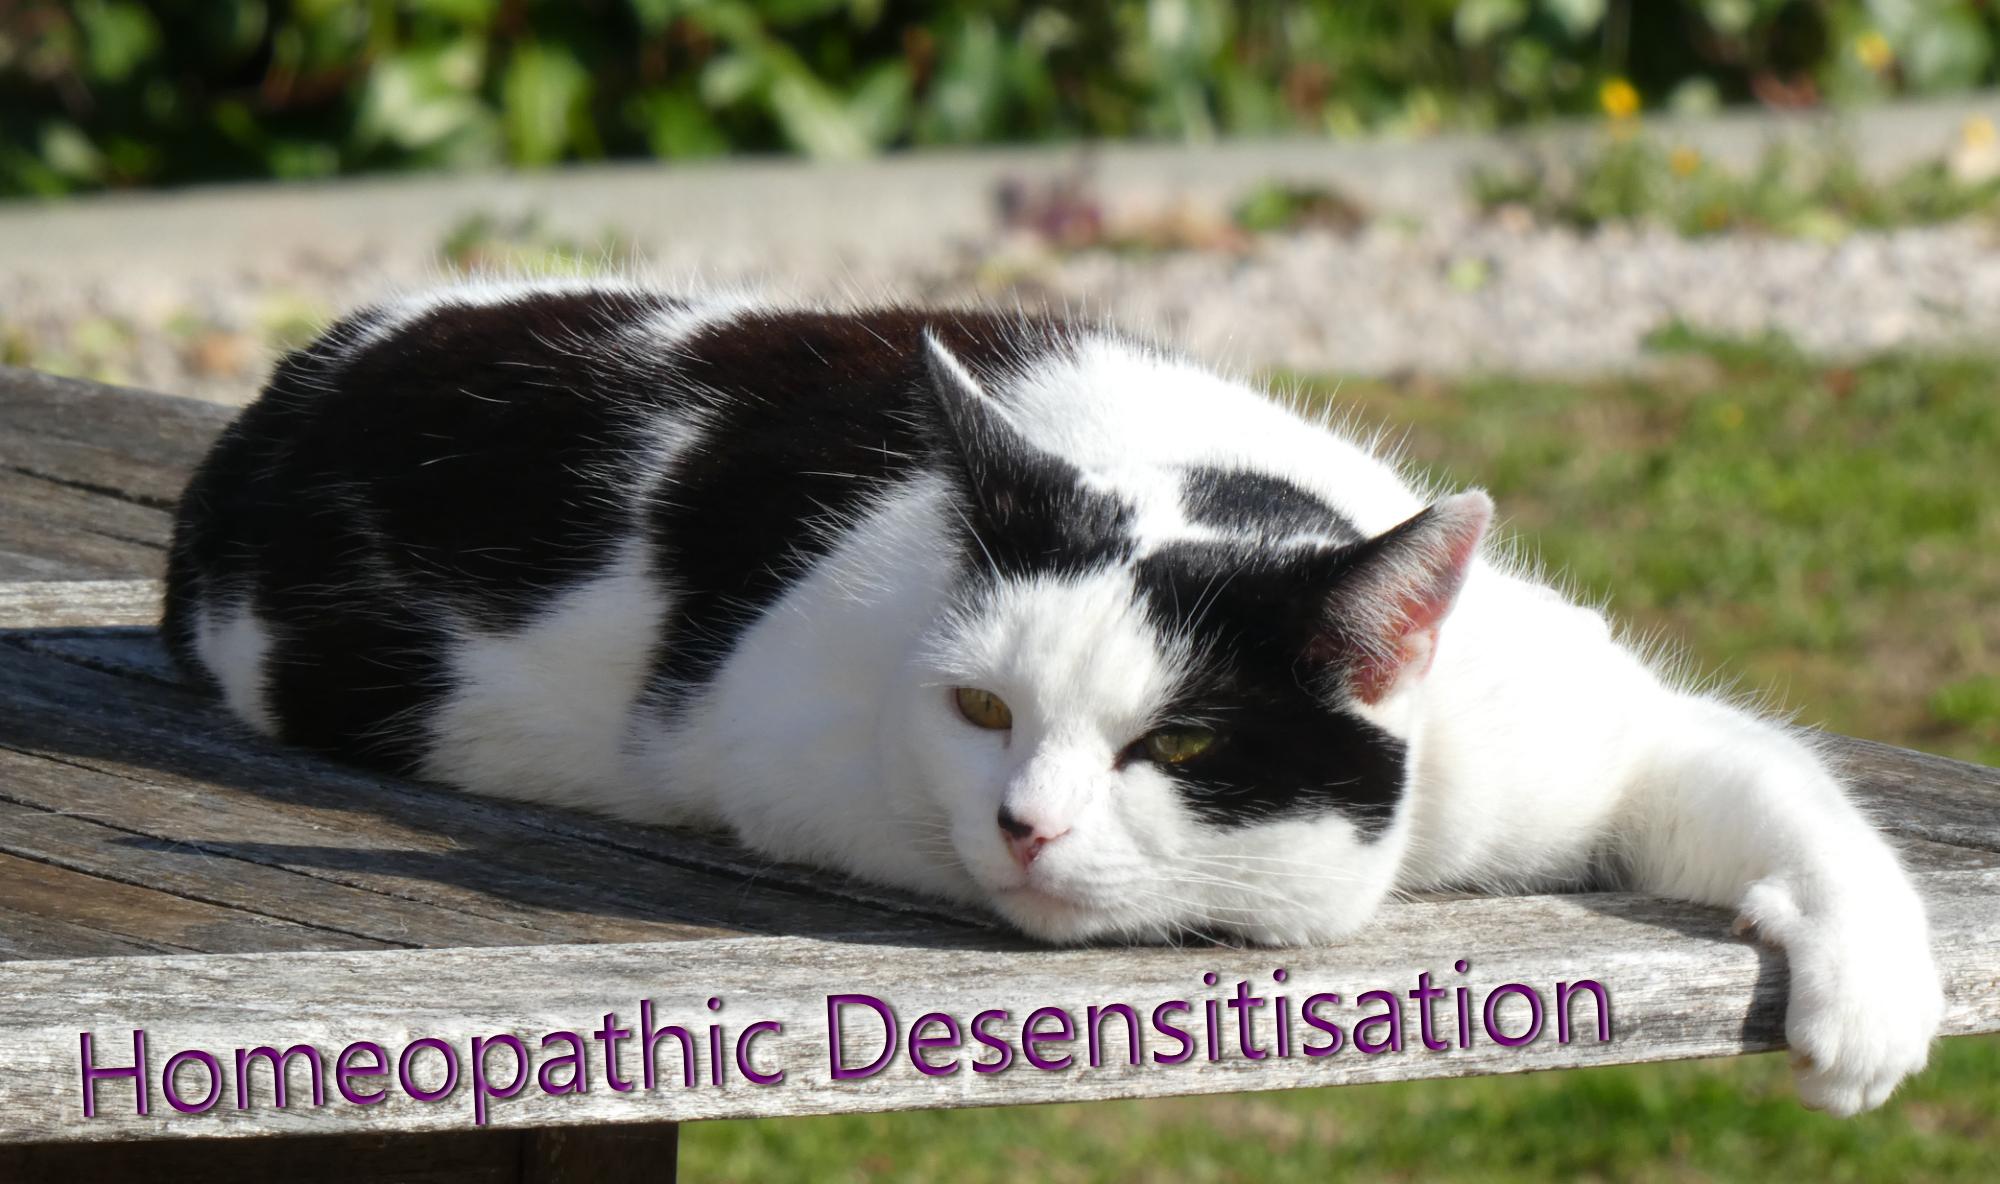 Homeopathic Desensitisation